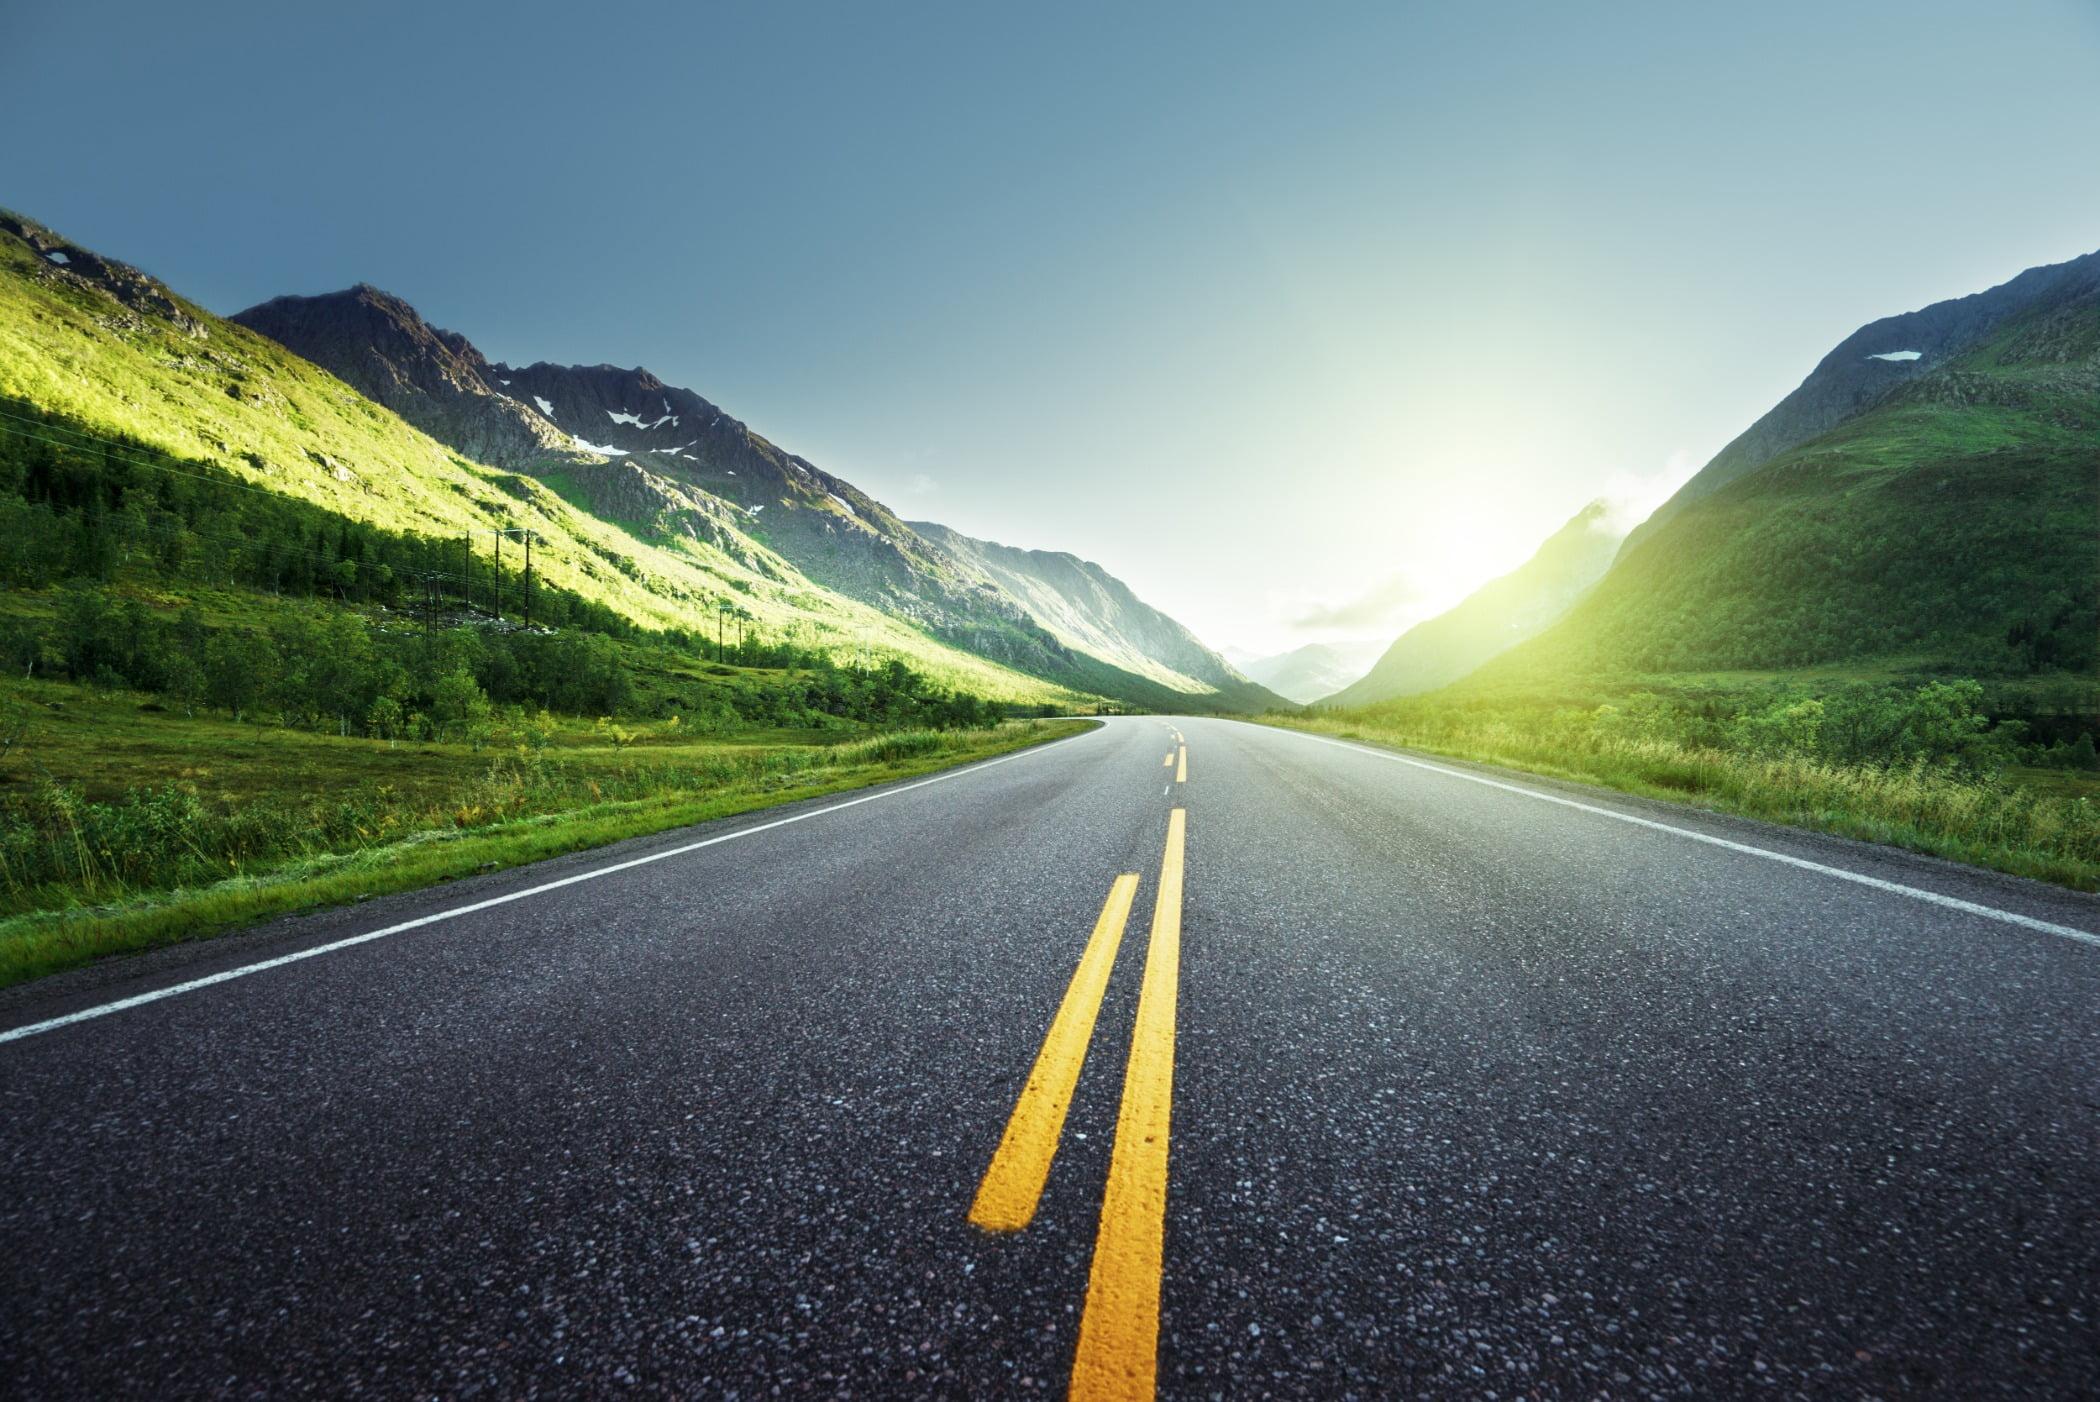 Road surface, Natural landscape, Mountainous landforms, Infrastructure, Asphalt, Yellow, Grass, Green, Nature